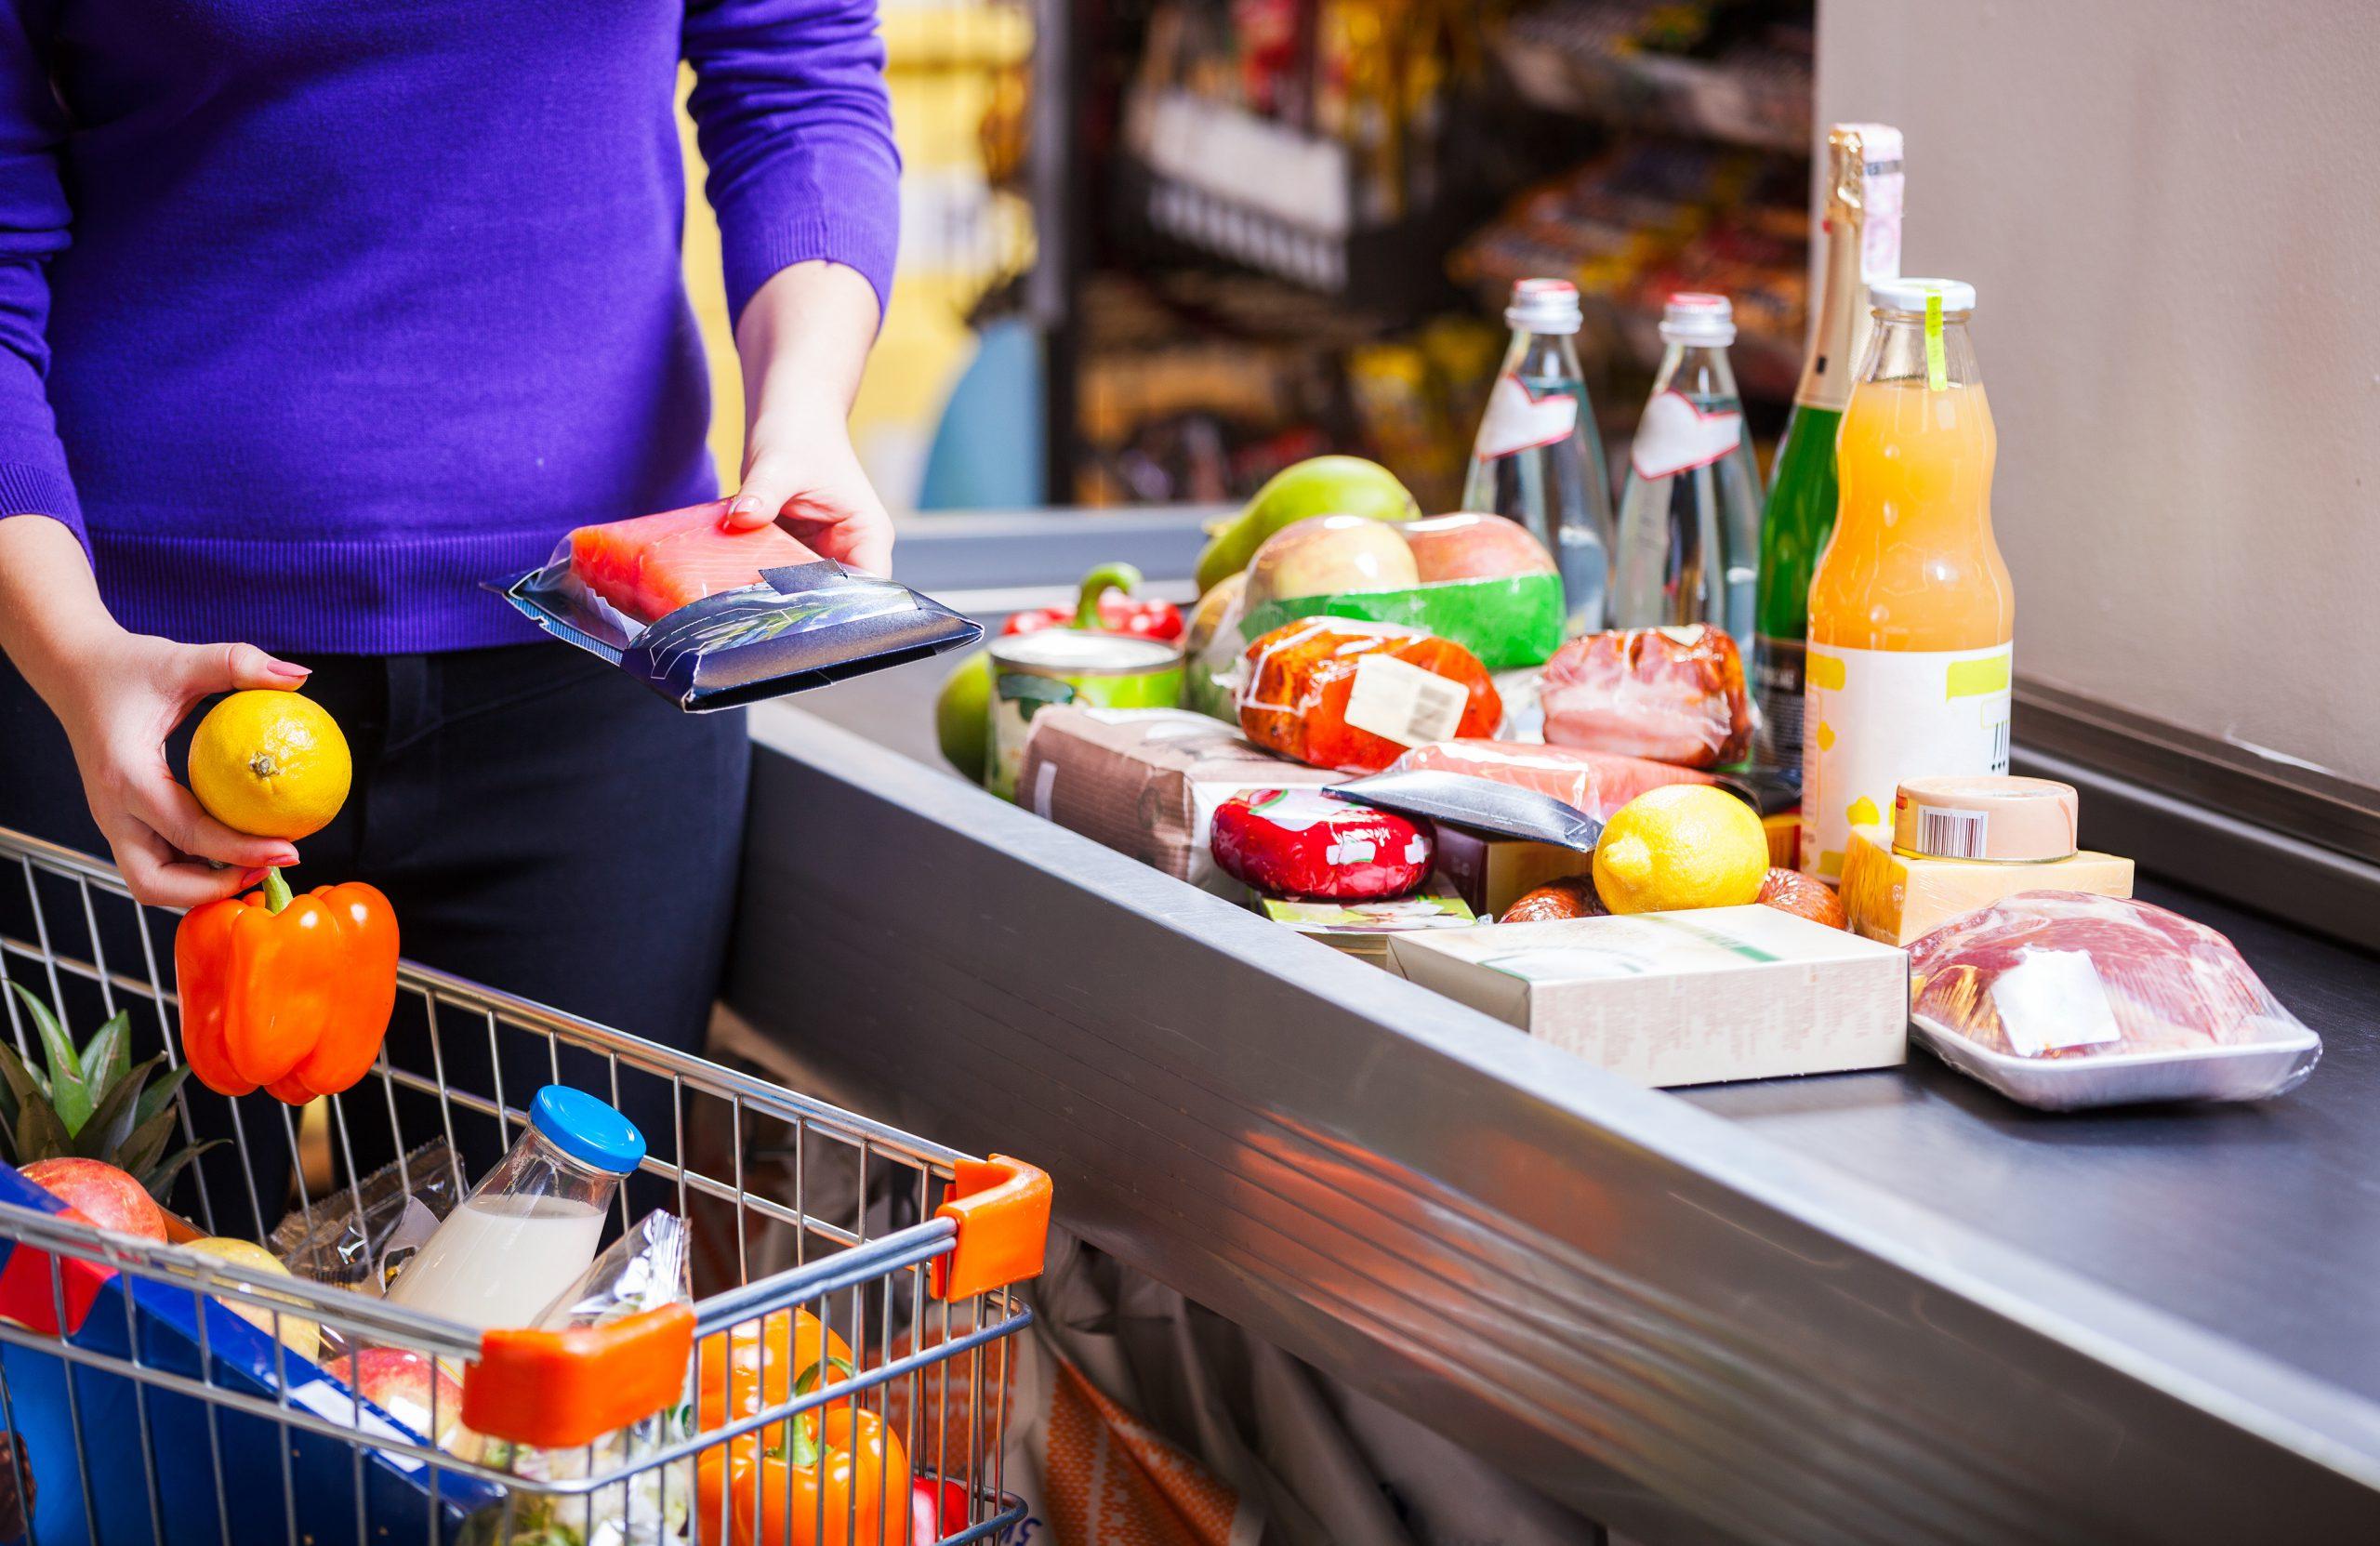 Kantar: Nastroje konsumentów najgorsze od 2015 r.